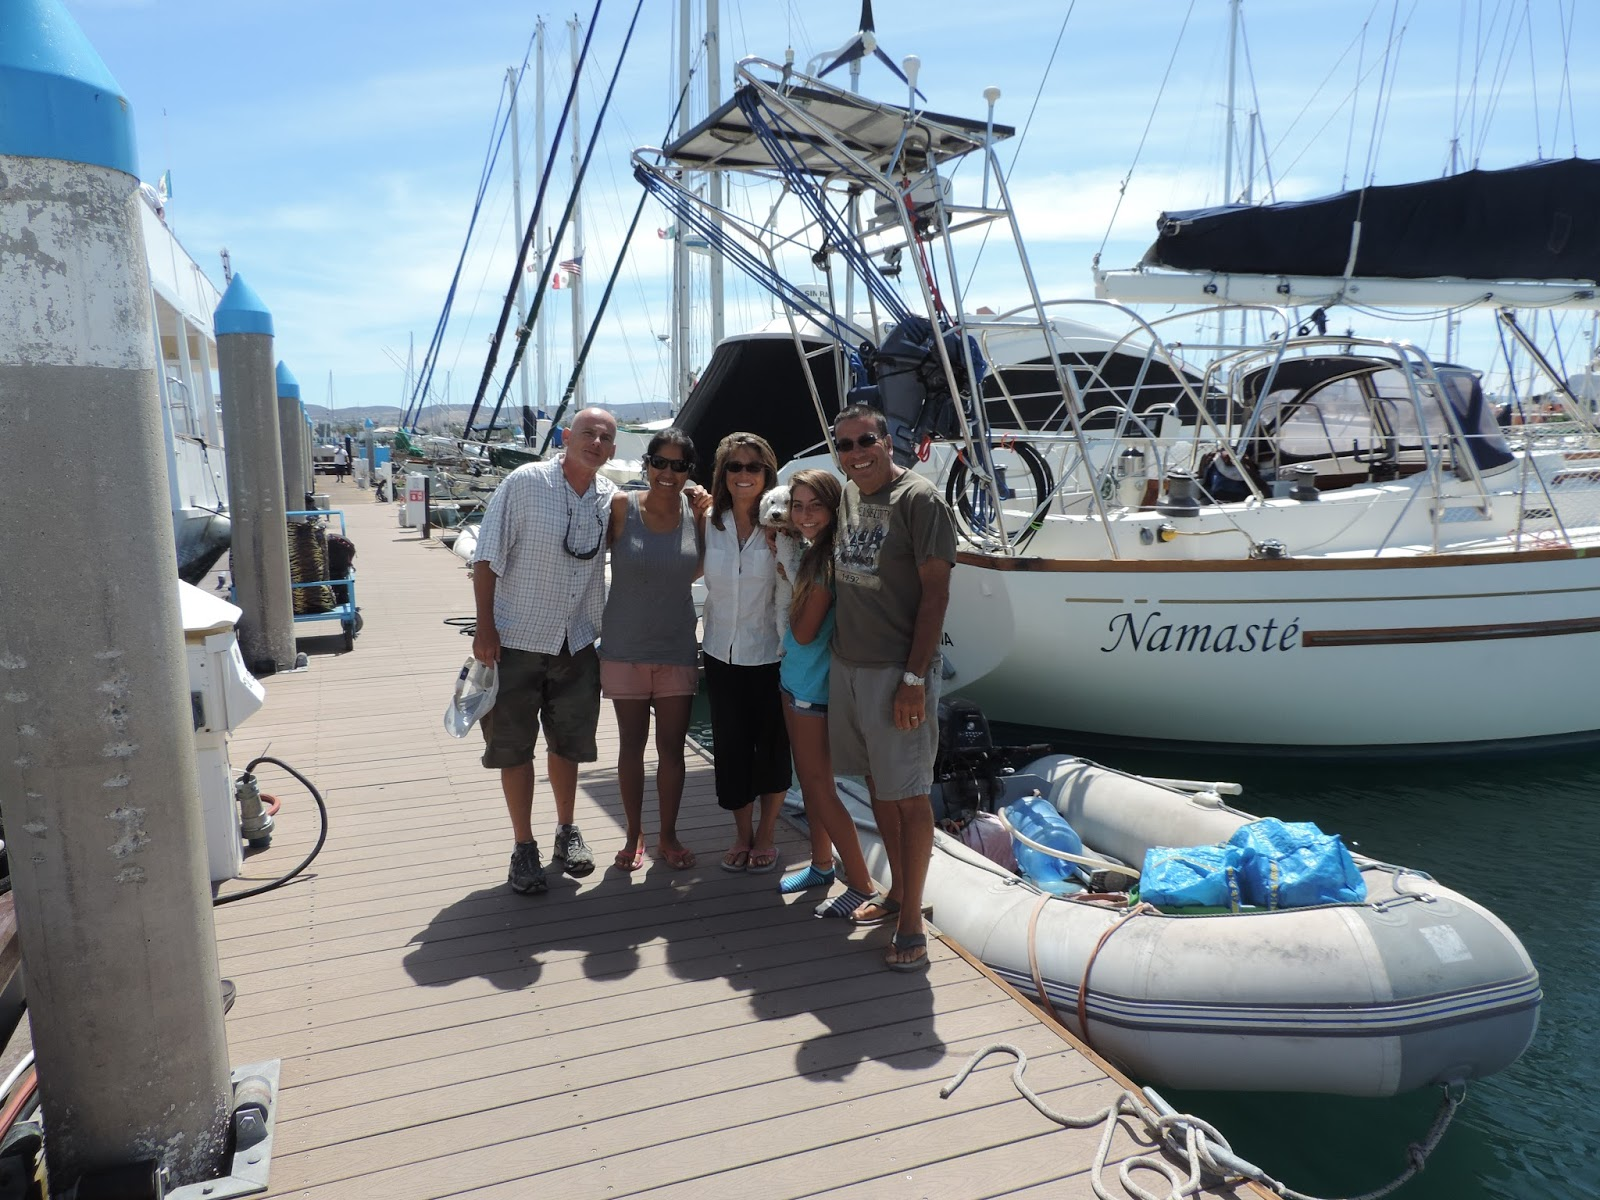 FAMILY OF THREE TAKE TO THE SEA